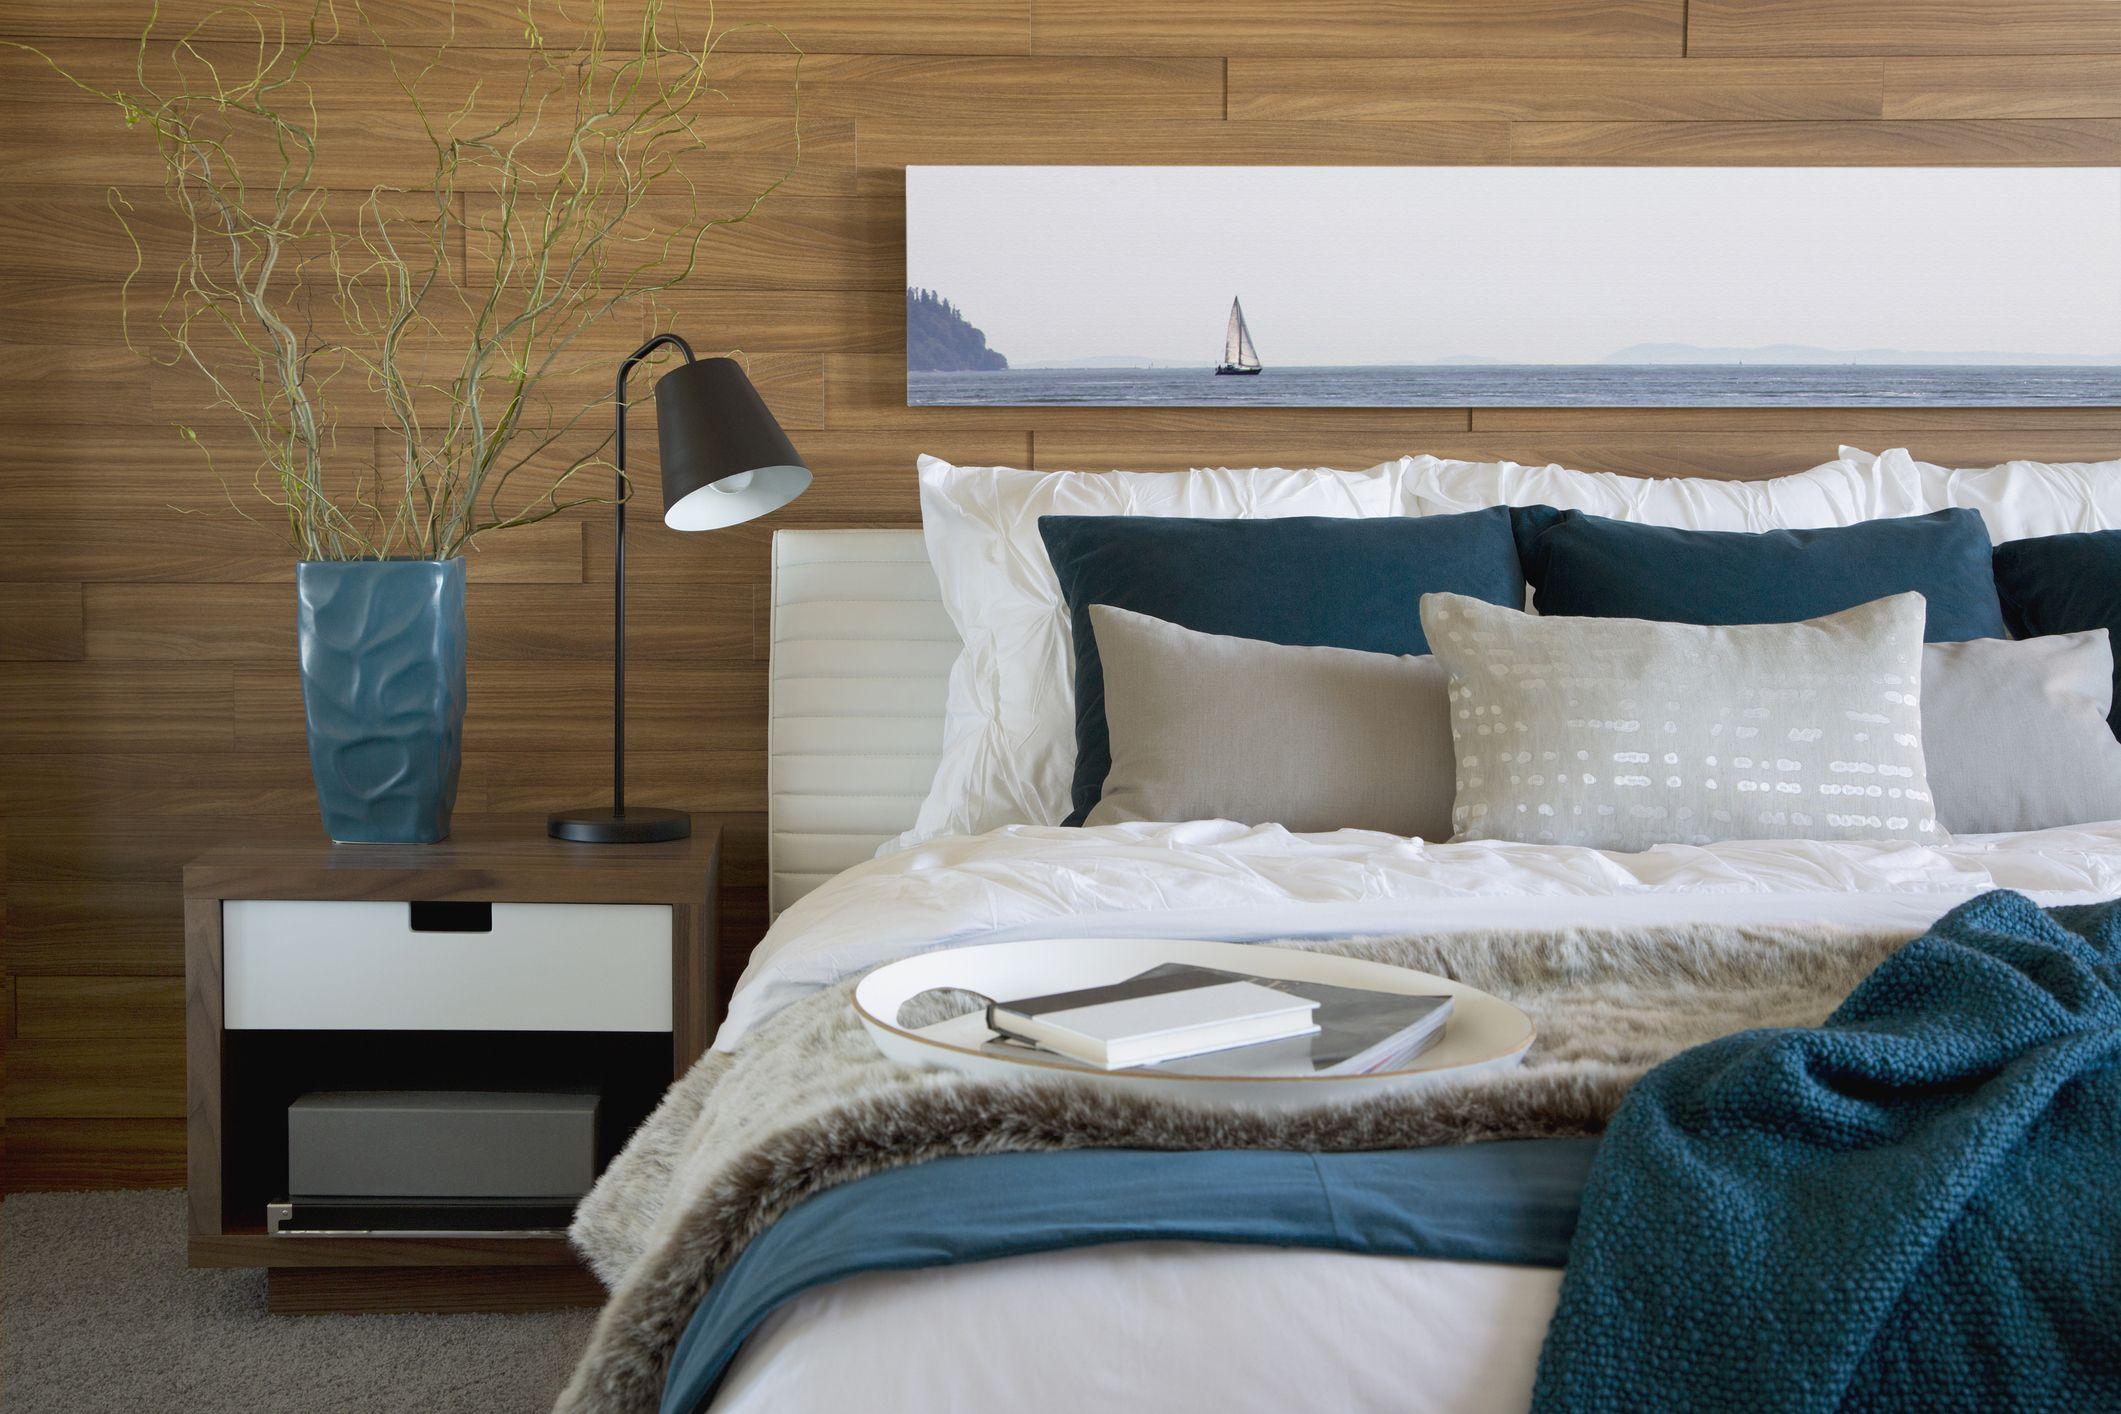 40 Easy Bedroom Makeover Ideas , DIY Master Bedroom Decor on